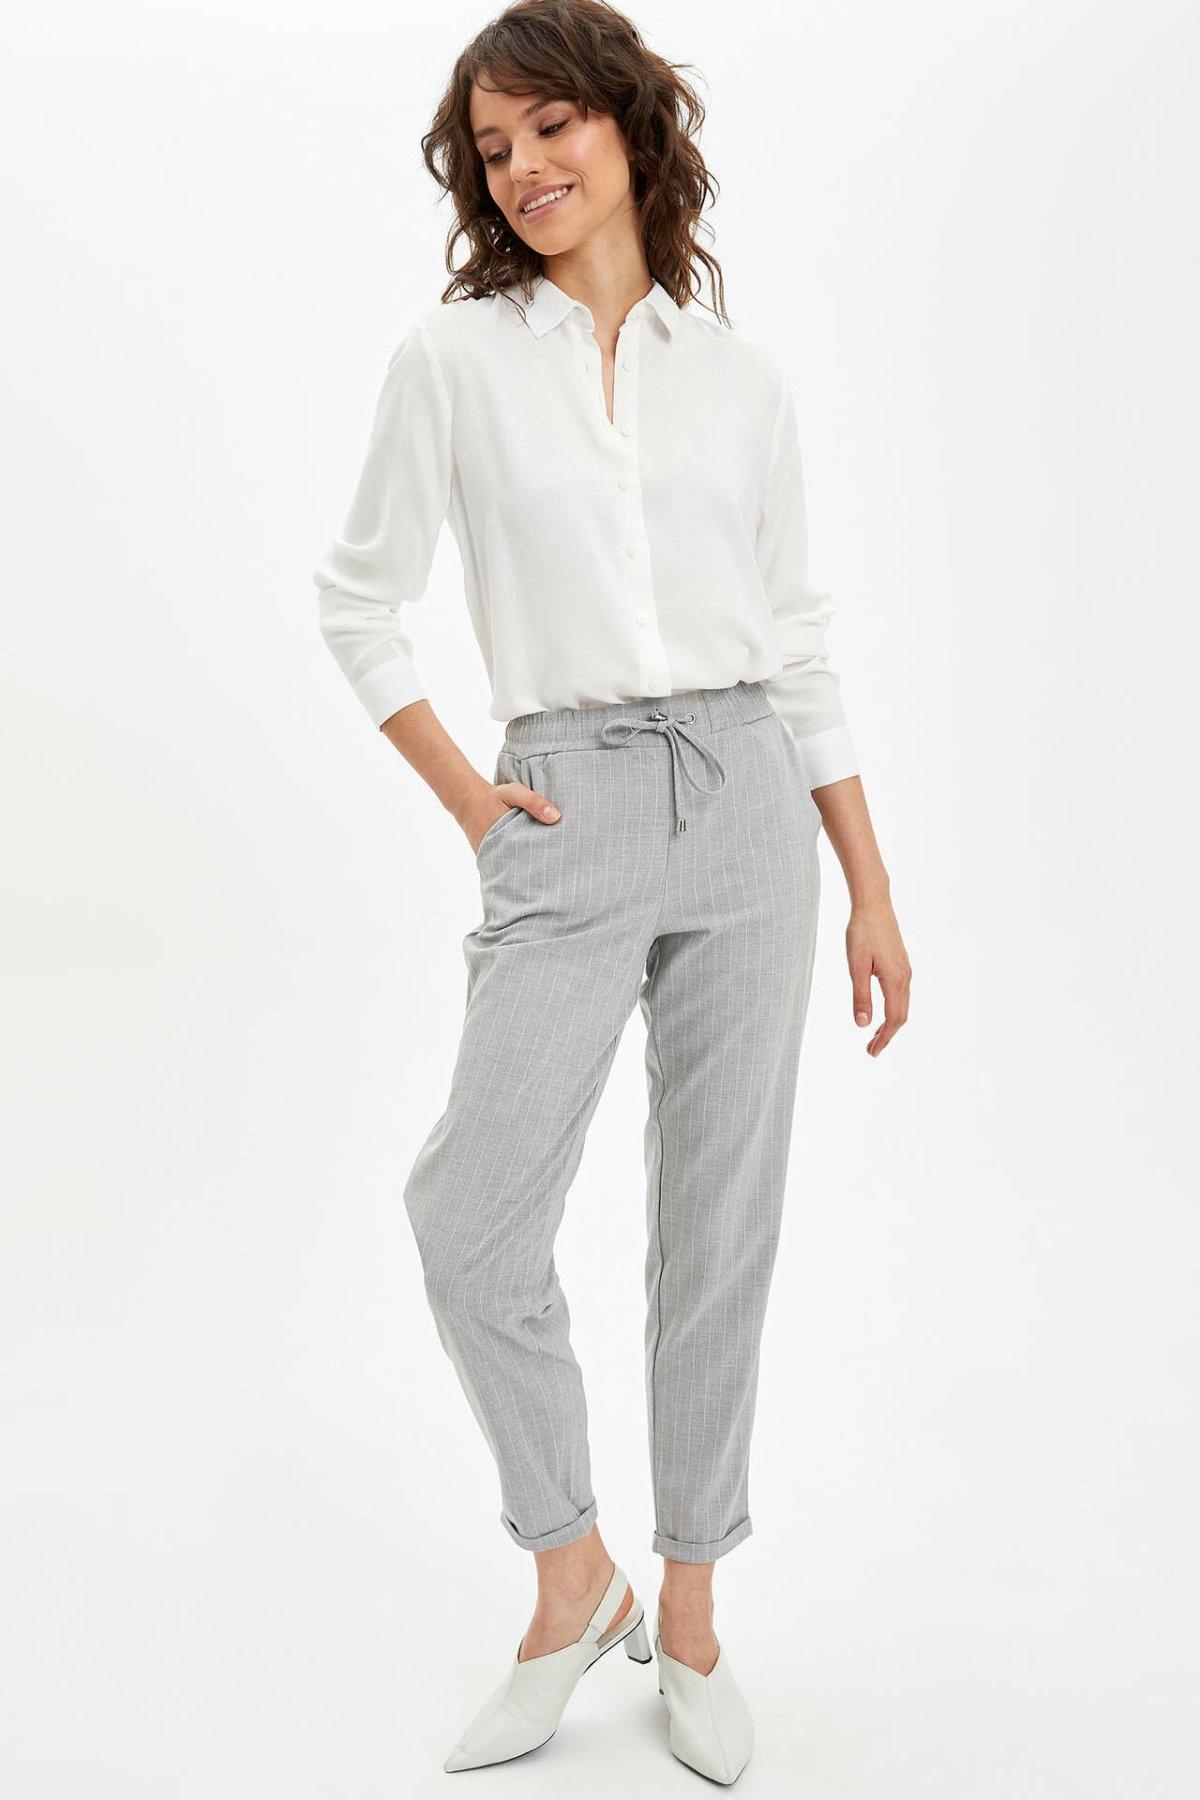 DeFacto Woman Spring Cargo Pants Women Grey Black Plaids Pants Women Straight Ninth Trousers-I4364AZ20SP